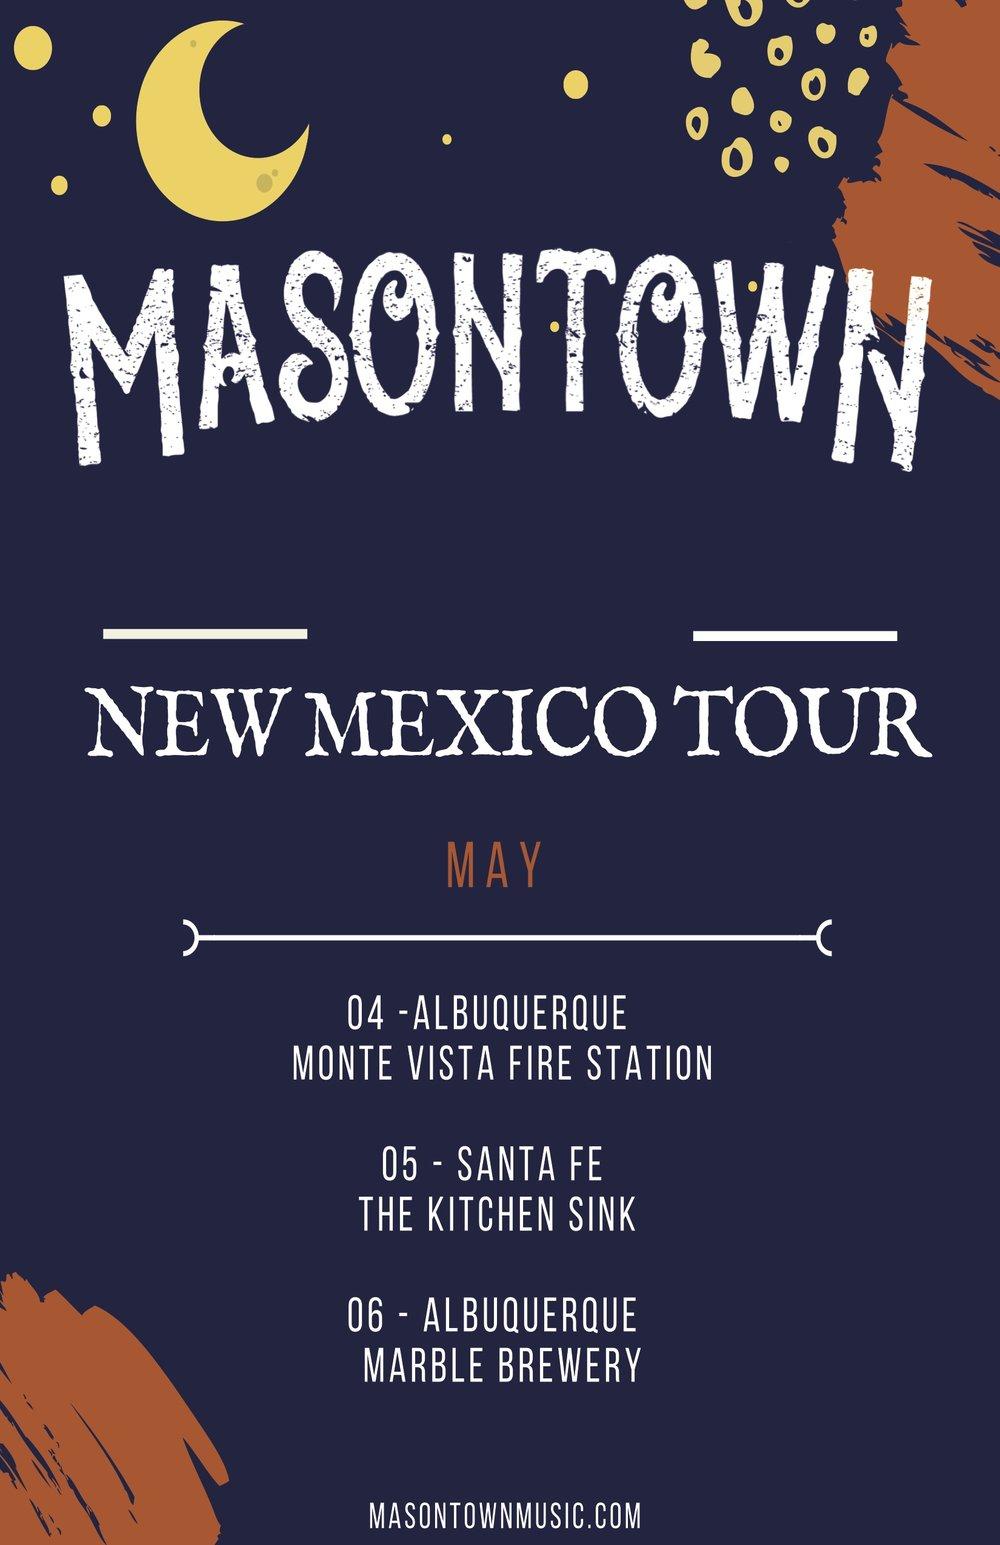 Masontown Poster.jpg